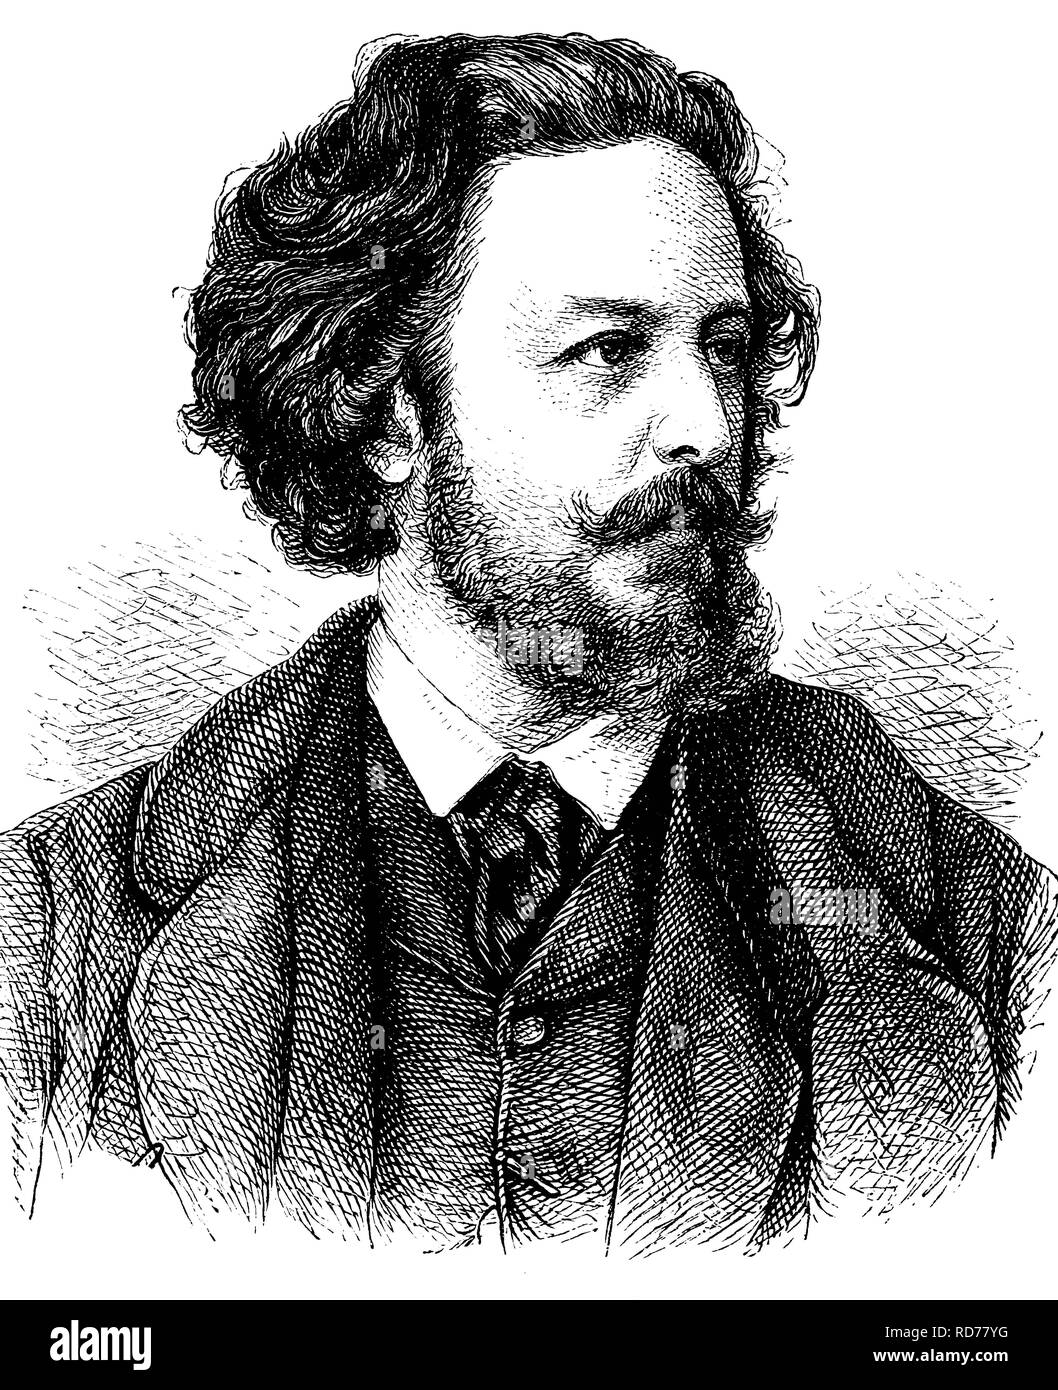 Paul Heyse, 1830-1914, German writer, historical illustration, circa 1886 - Stock Image